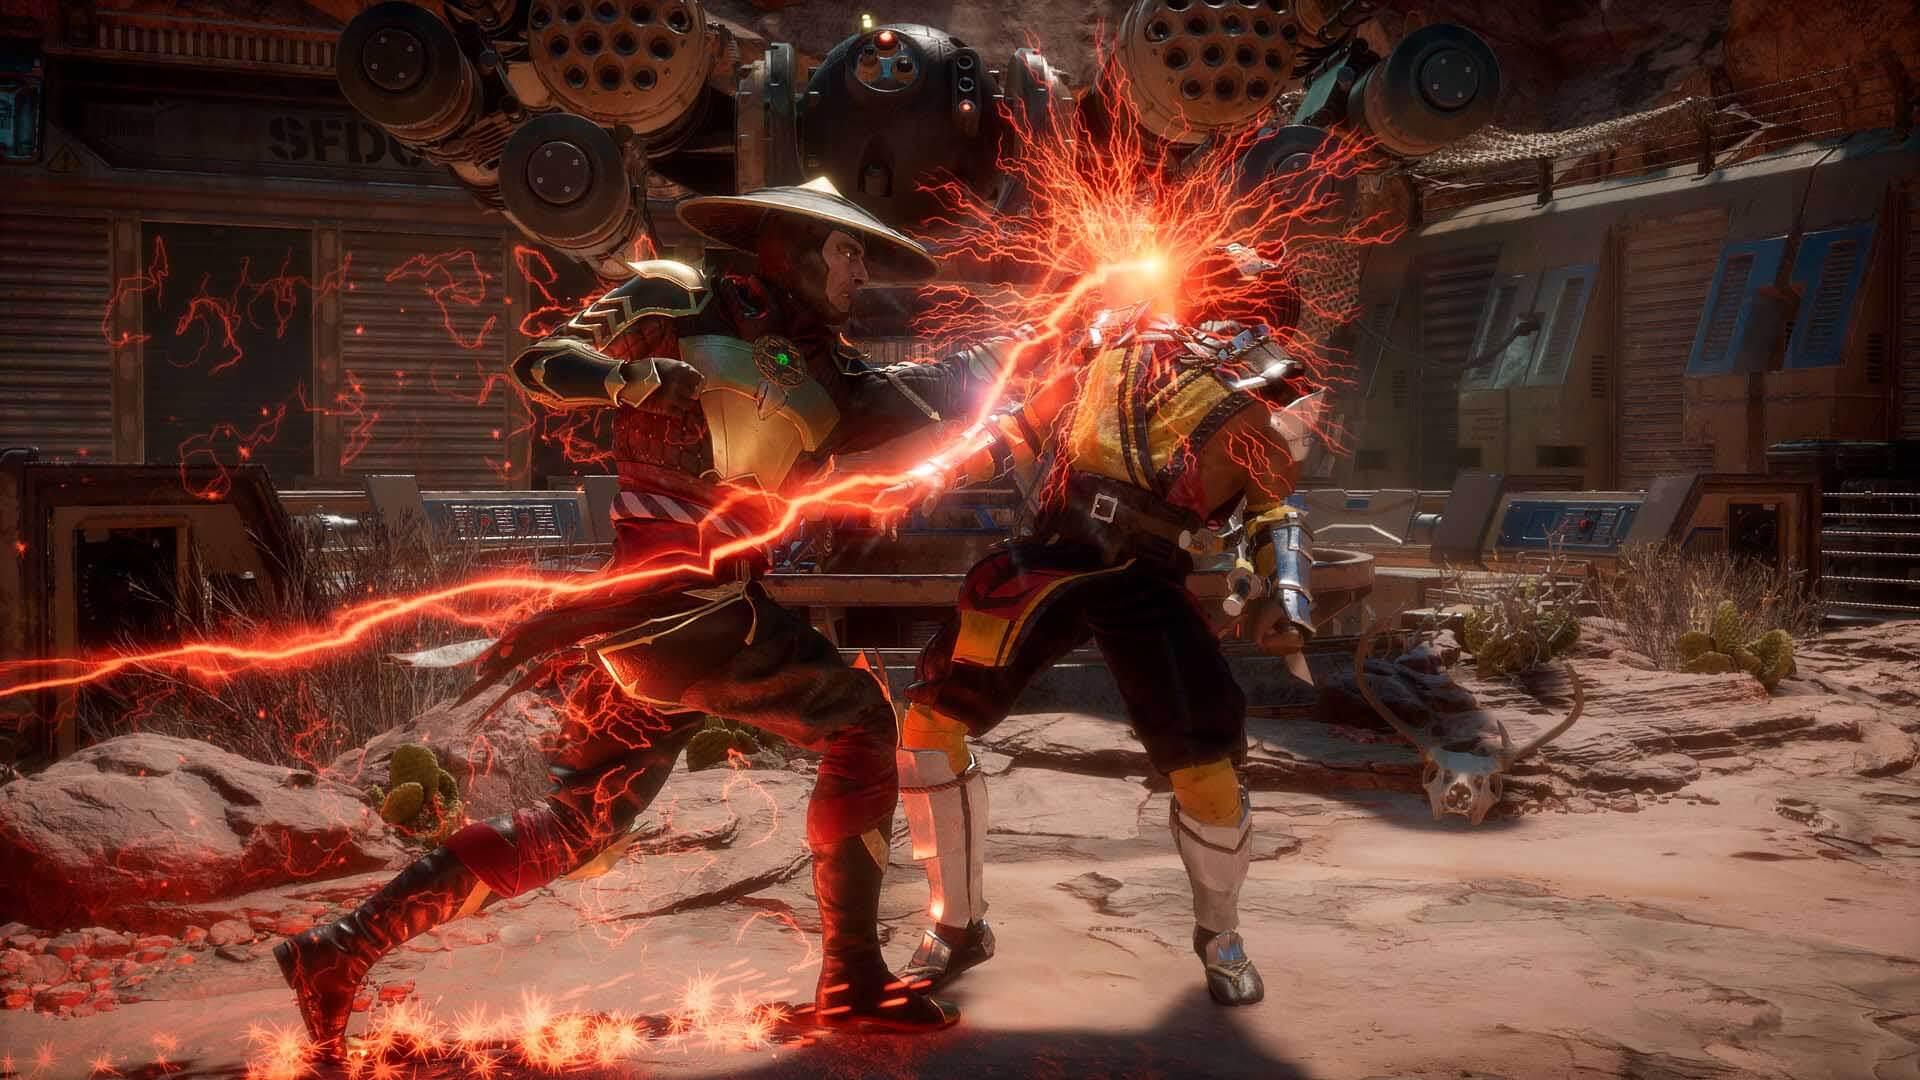 Mortal Kombat 11 NetherRealm